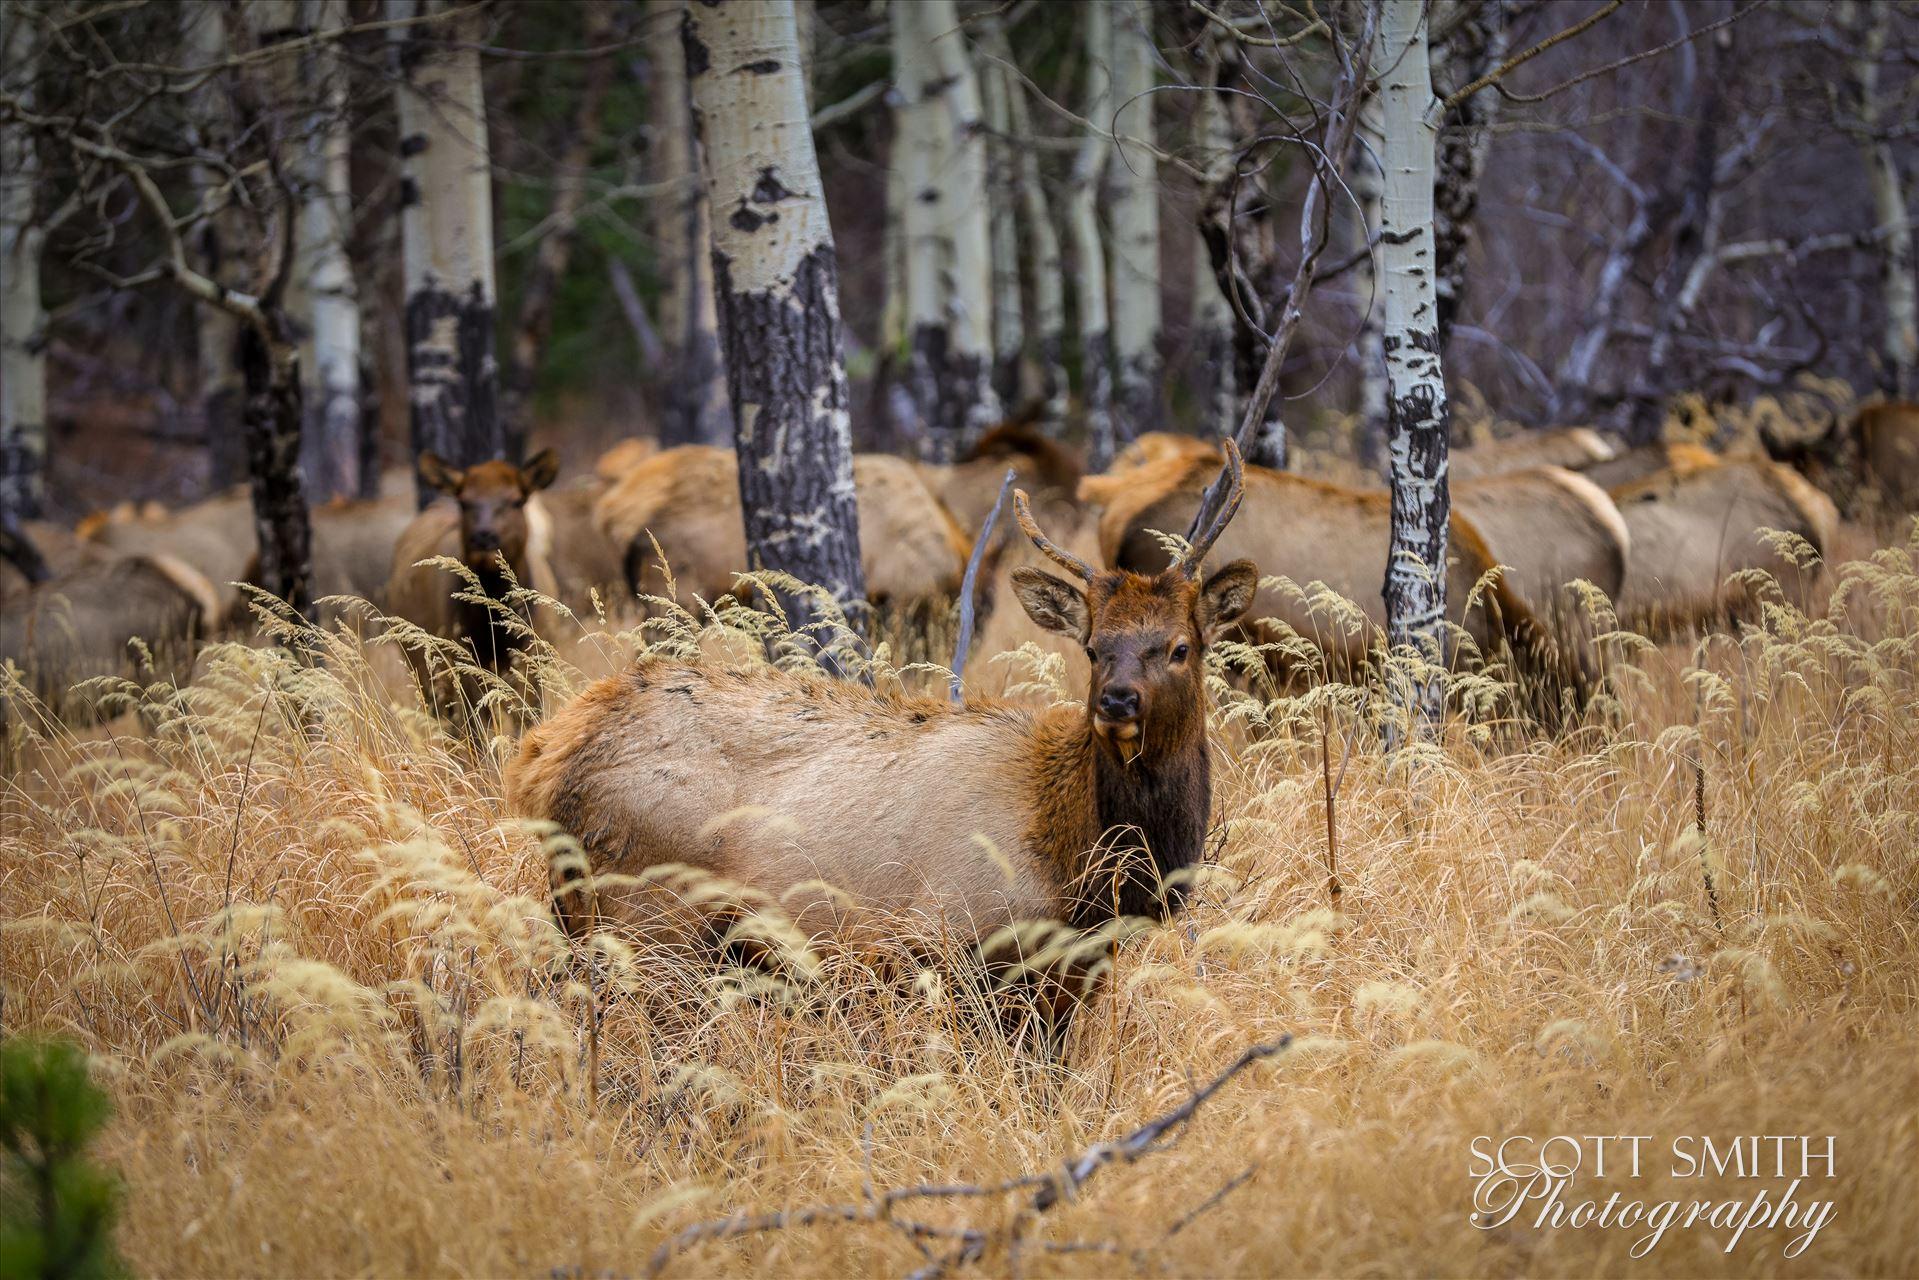 Sunday Elk No 01 - A heard of Elk near the entrance to Rocky Mountain National Park, Estes Park, Colorado. by D Scott Smith